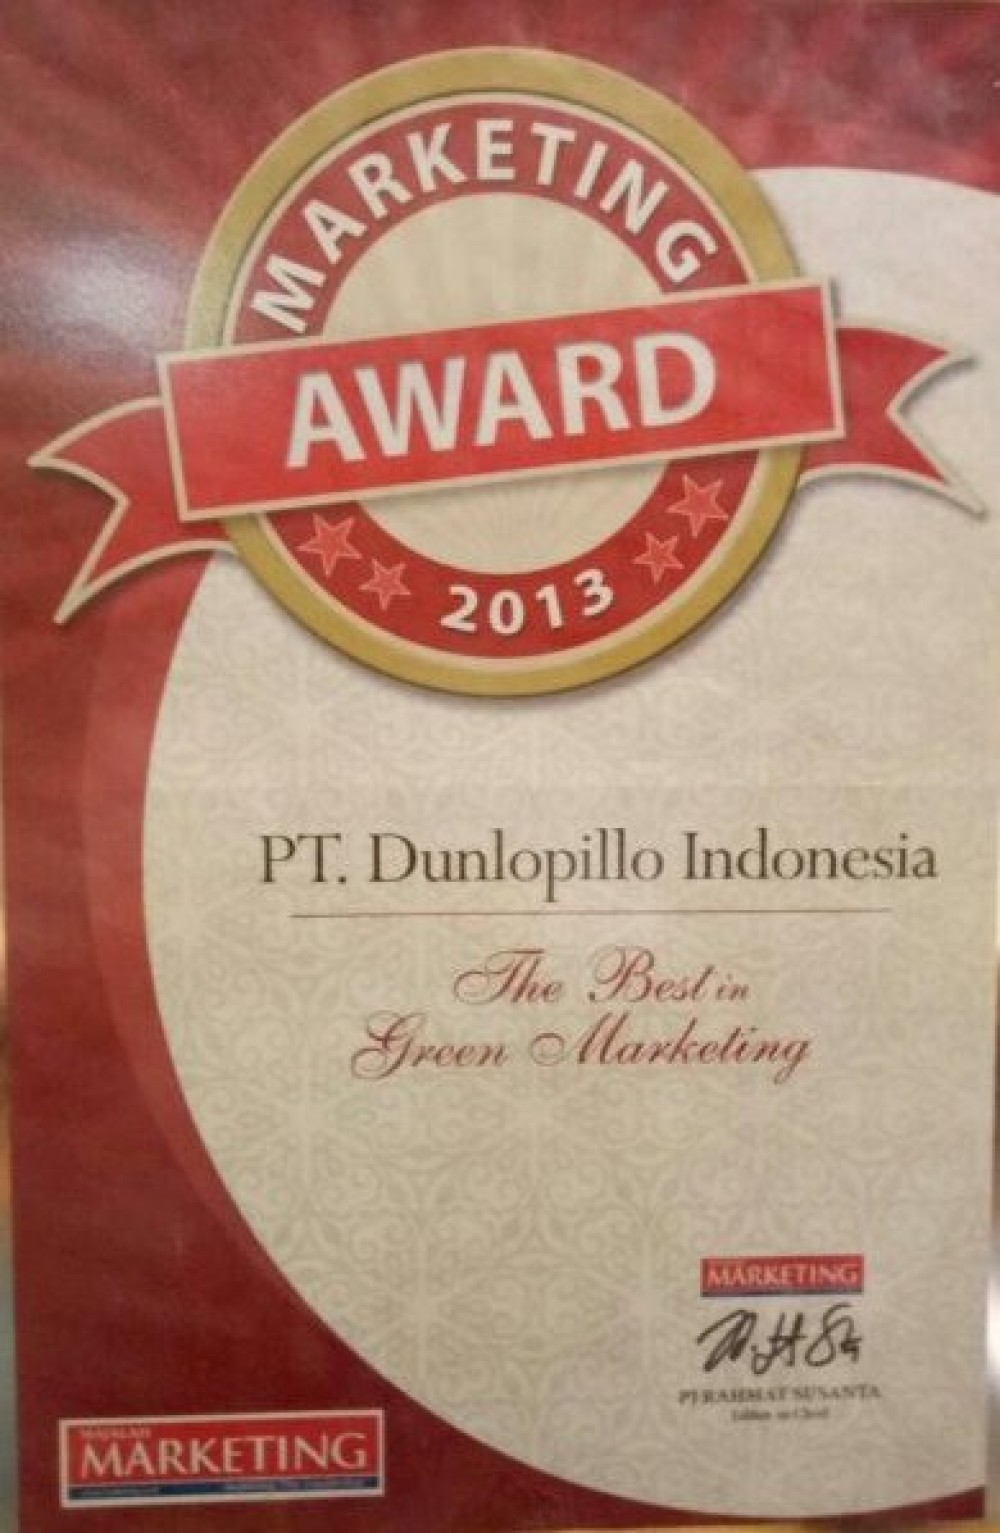 Marketing Award (The best in Green Marketing)